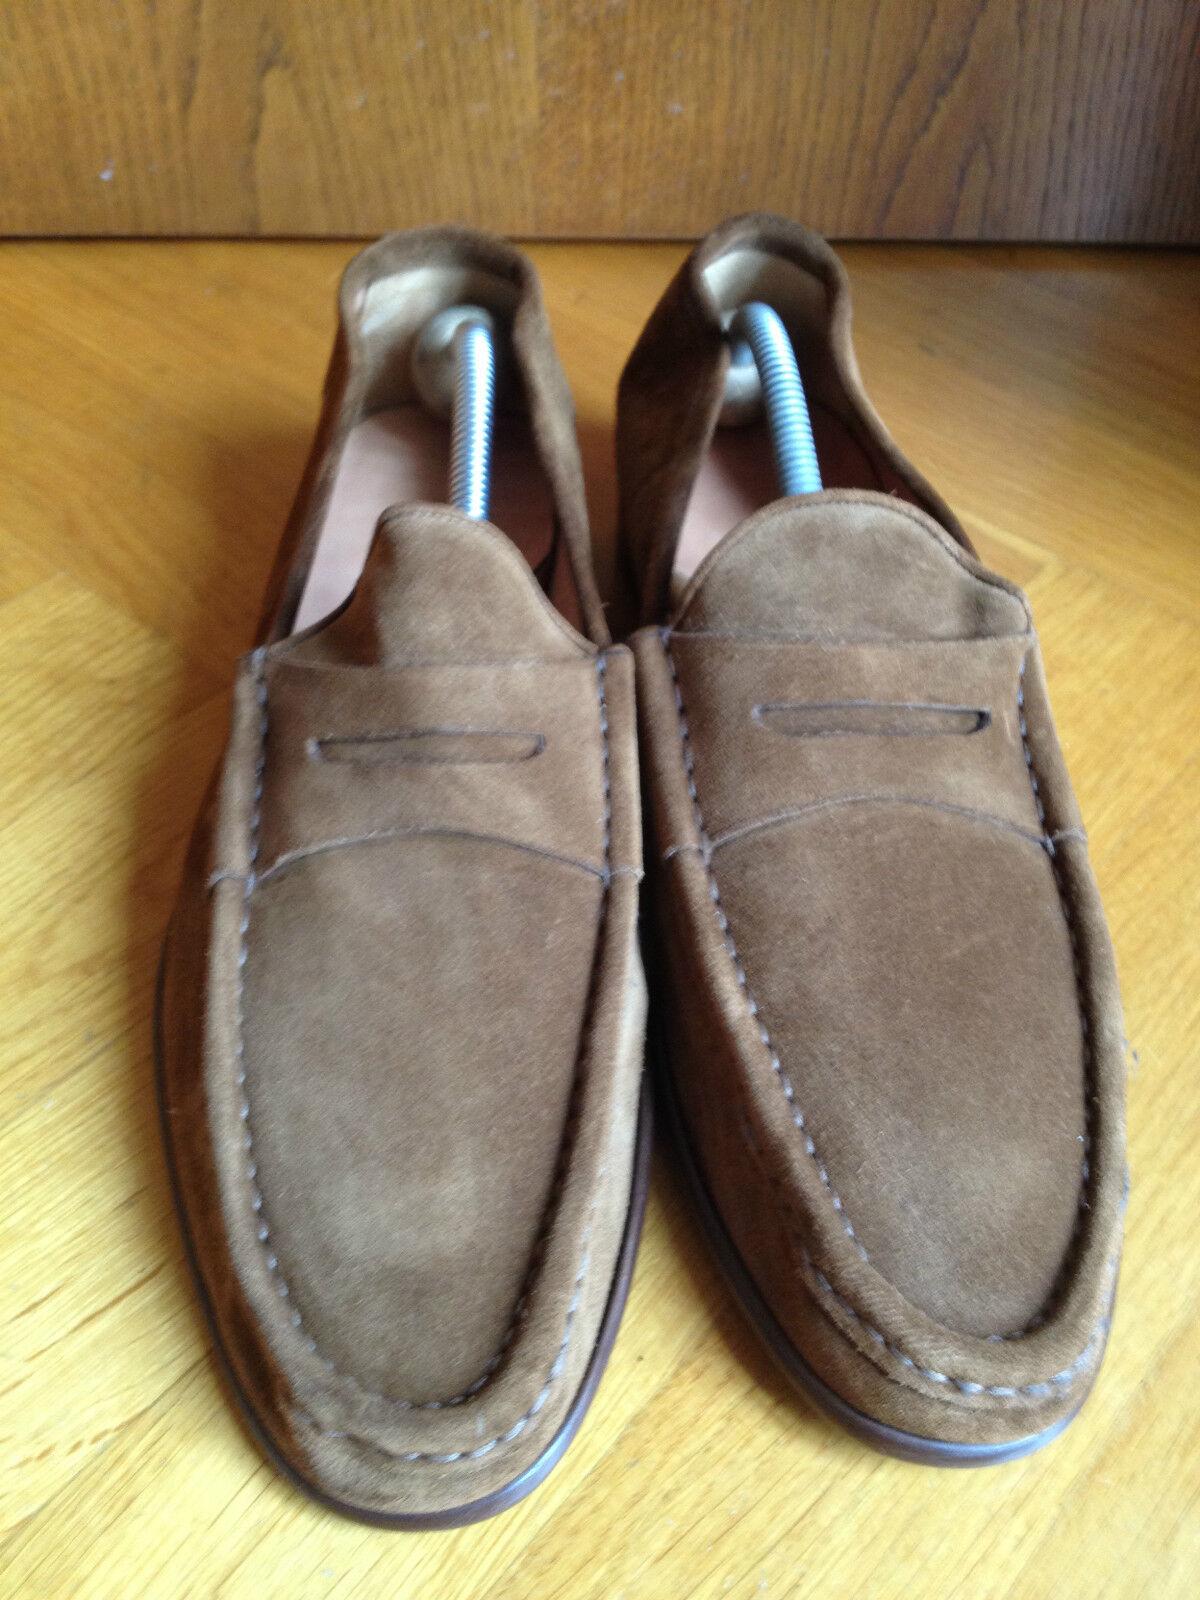 RALPH LAUREN brown BROWN SUEDE LOAFERS MOKASSIN DRESS SHOES US12 EUR 45 46 UK 11